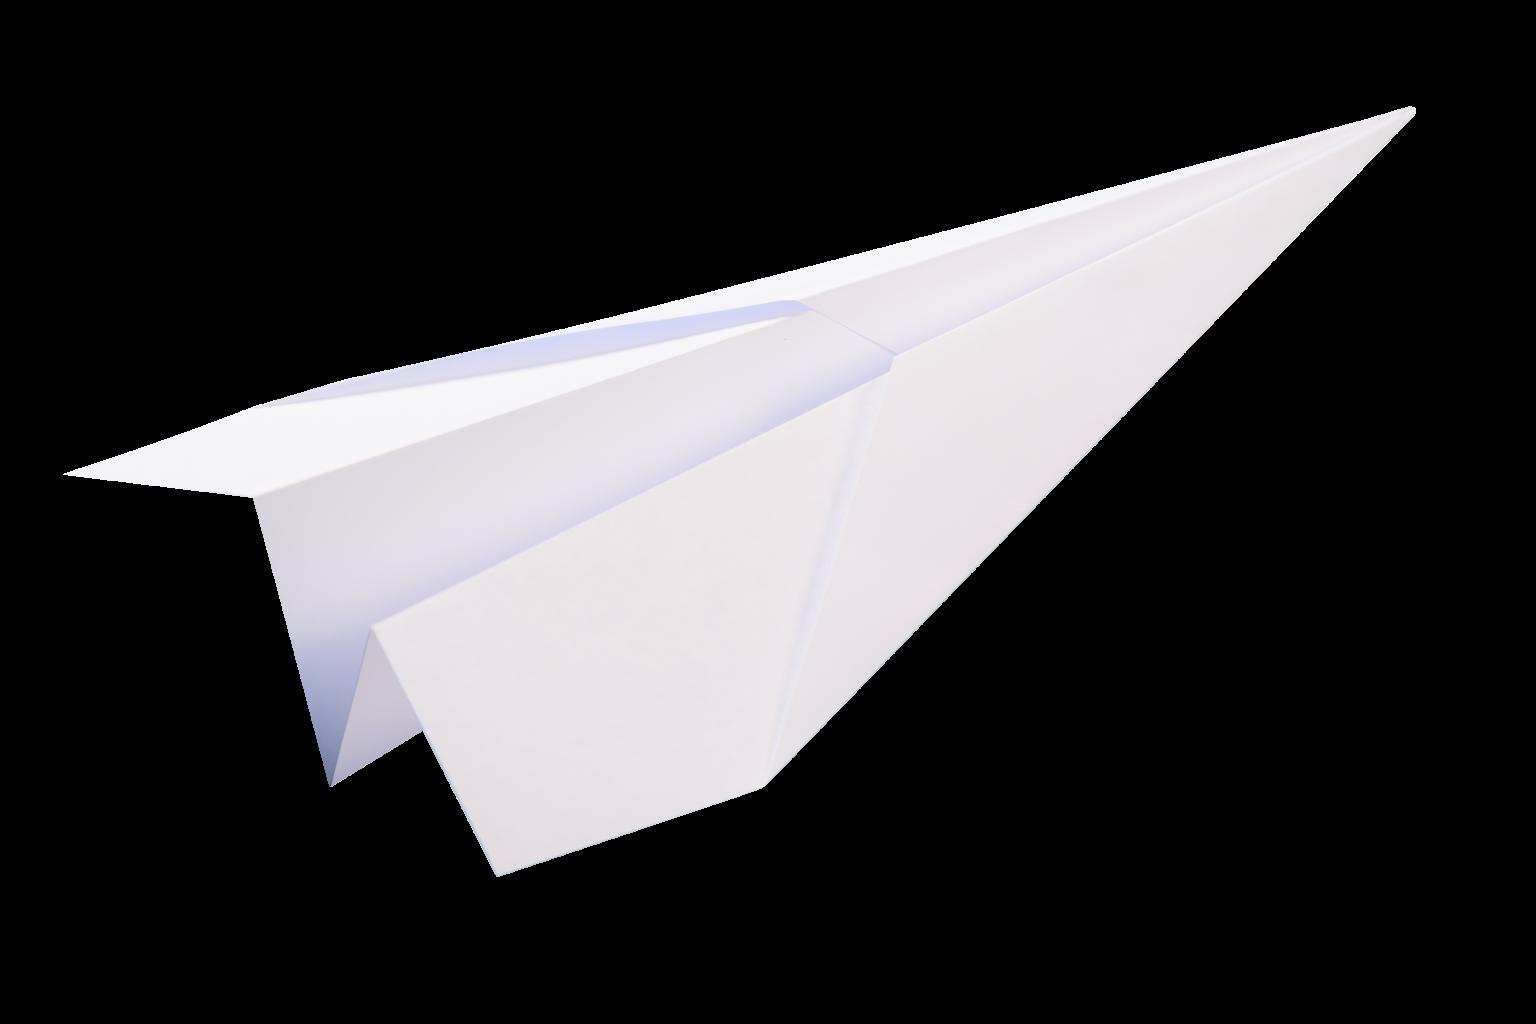 paper-plane-bulb